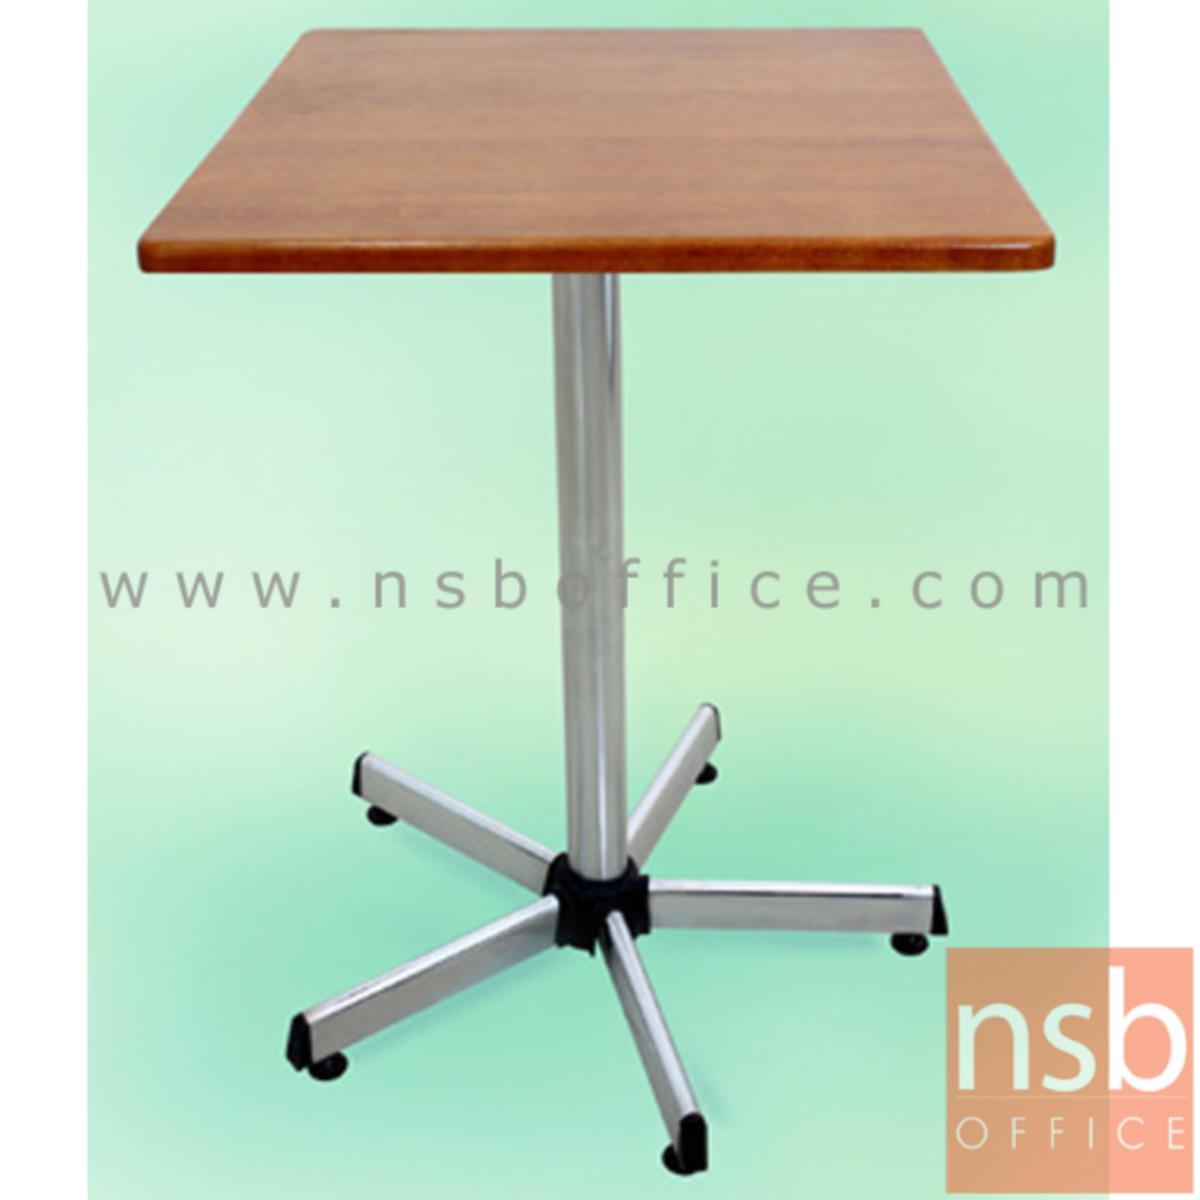 A14A007:โต๊ะไม้ยางพารา รุ่น Fyn (ฟิน) ขนาด 60W ,75W cm. ขาเหล็ก